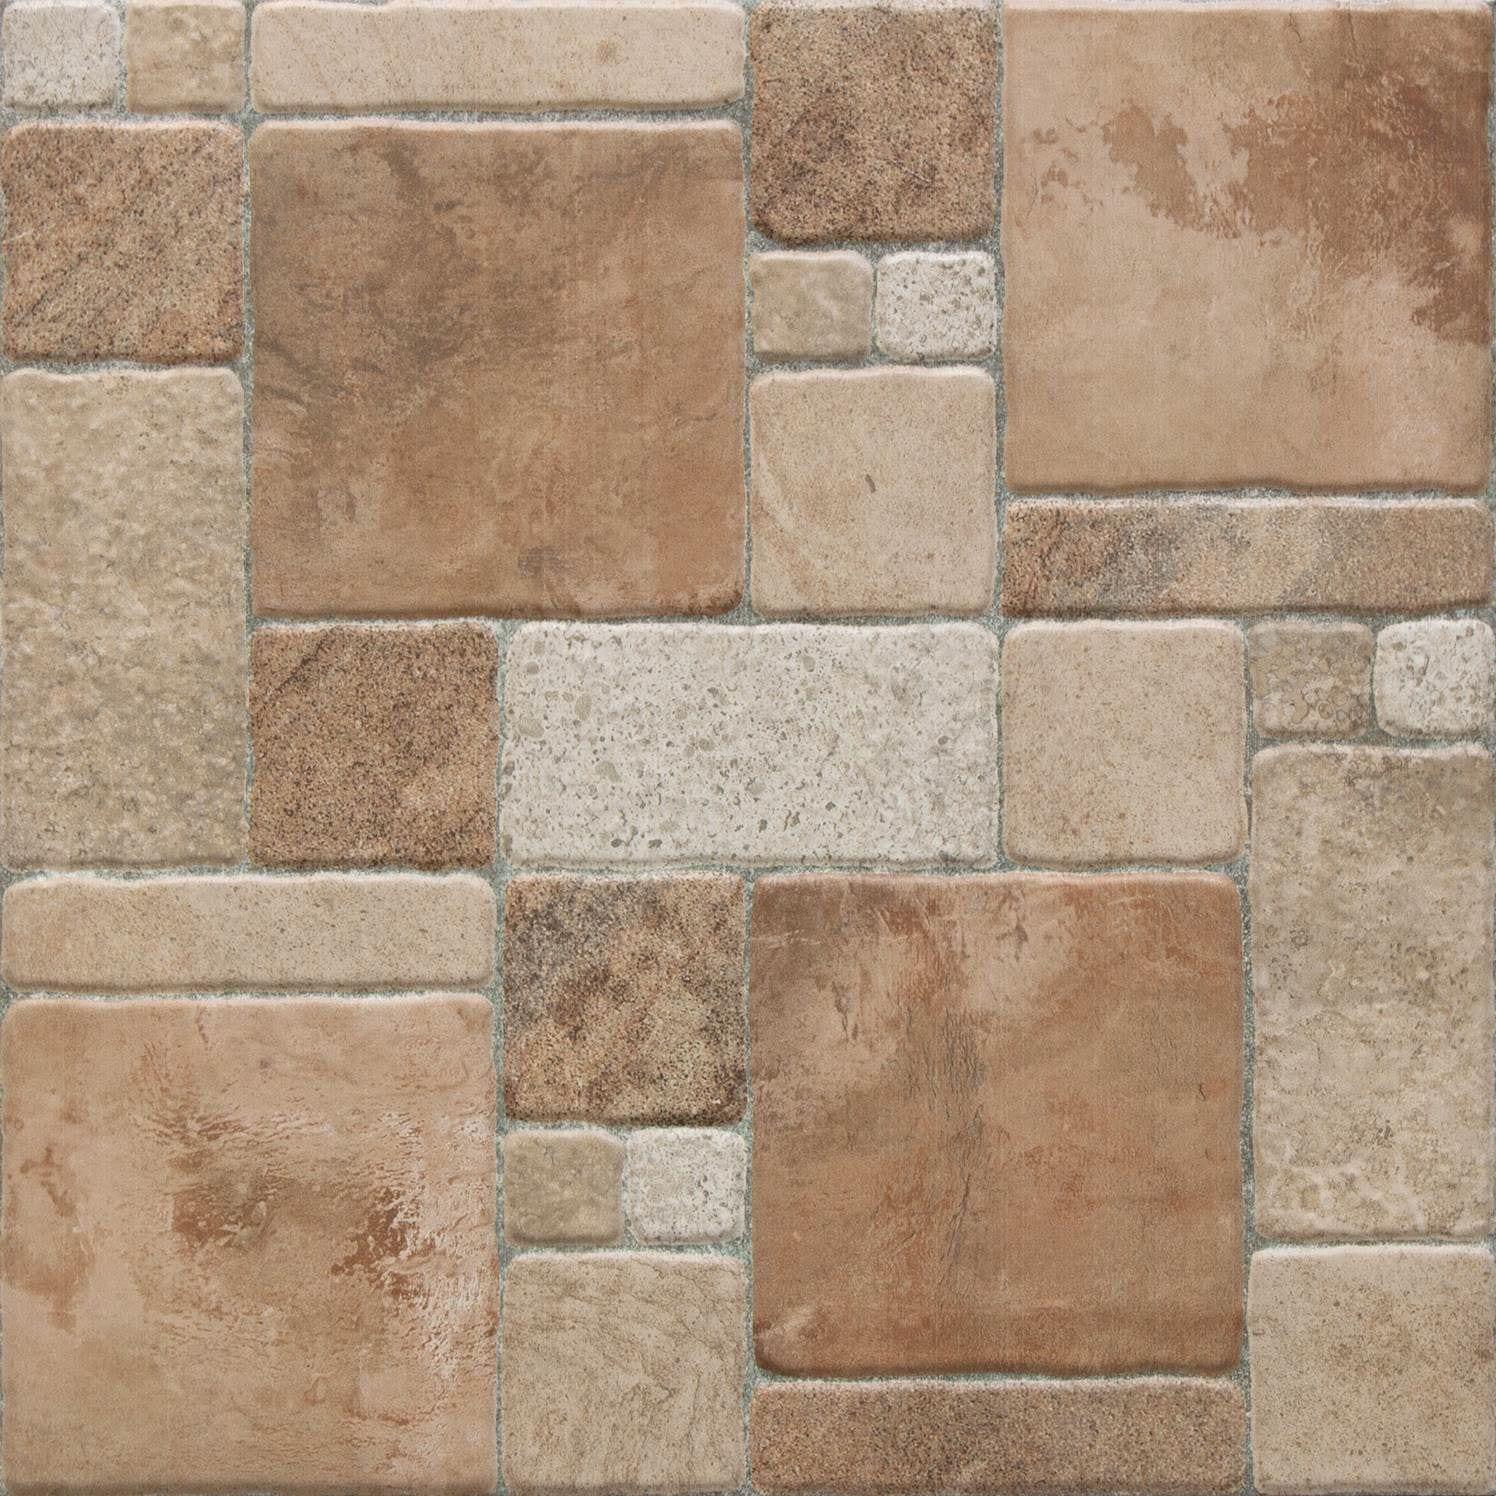 Serie monterrey azulejo de gres antideslizante en formato - Pavimentos exteriores antideslizantes ...